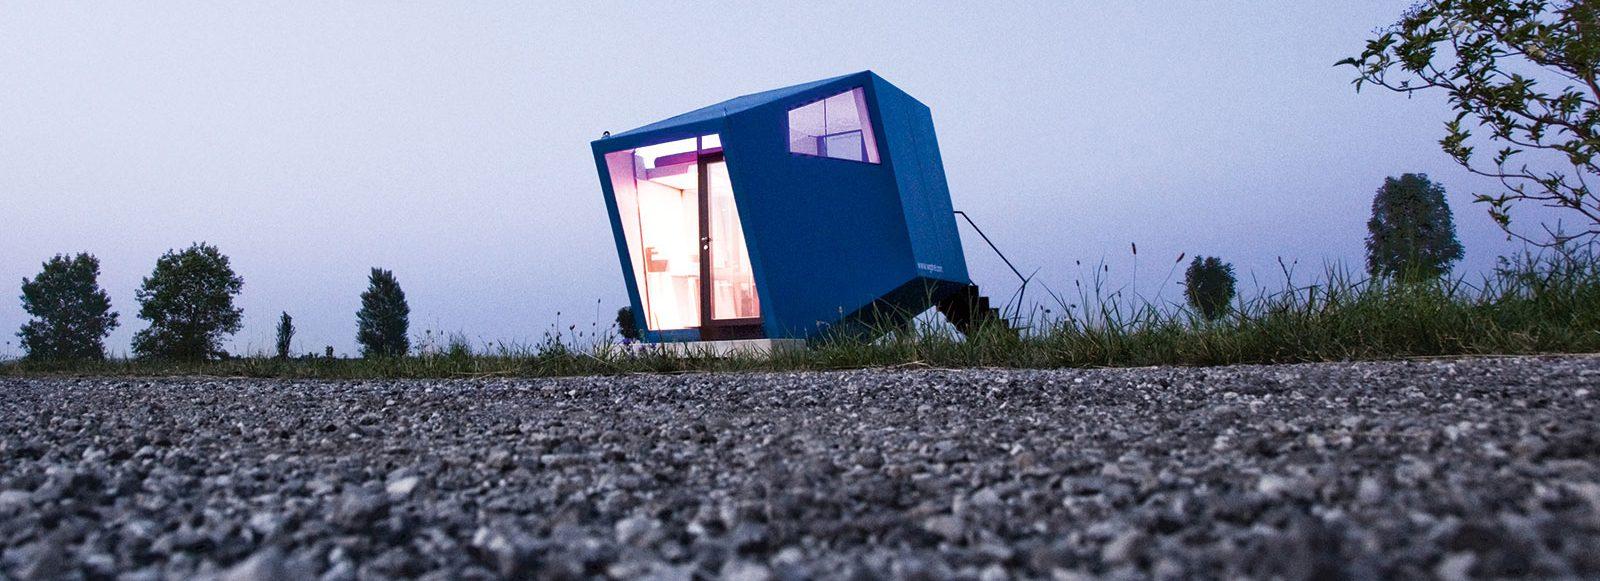 living in a box maxima. Black Bedroom Furniture Sets. Home Design Ideas